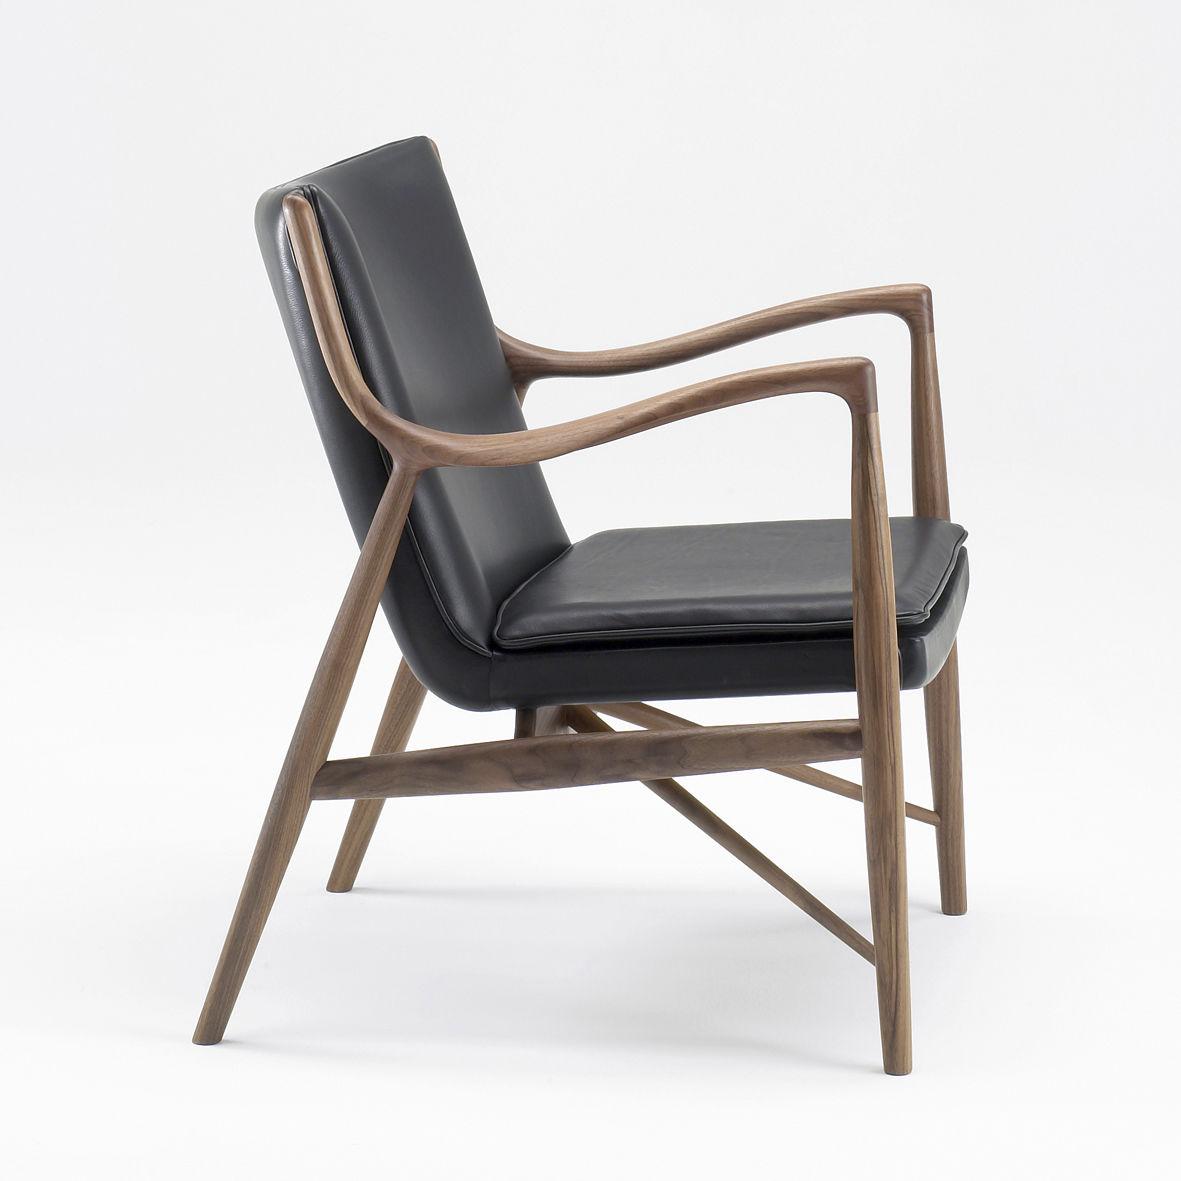 Scandinavian Design Armchair / Wooden / Fabric / Leather   45